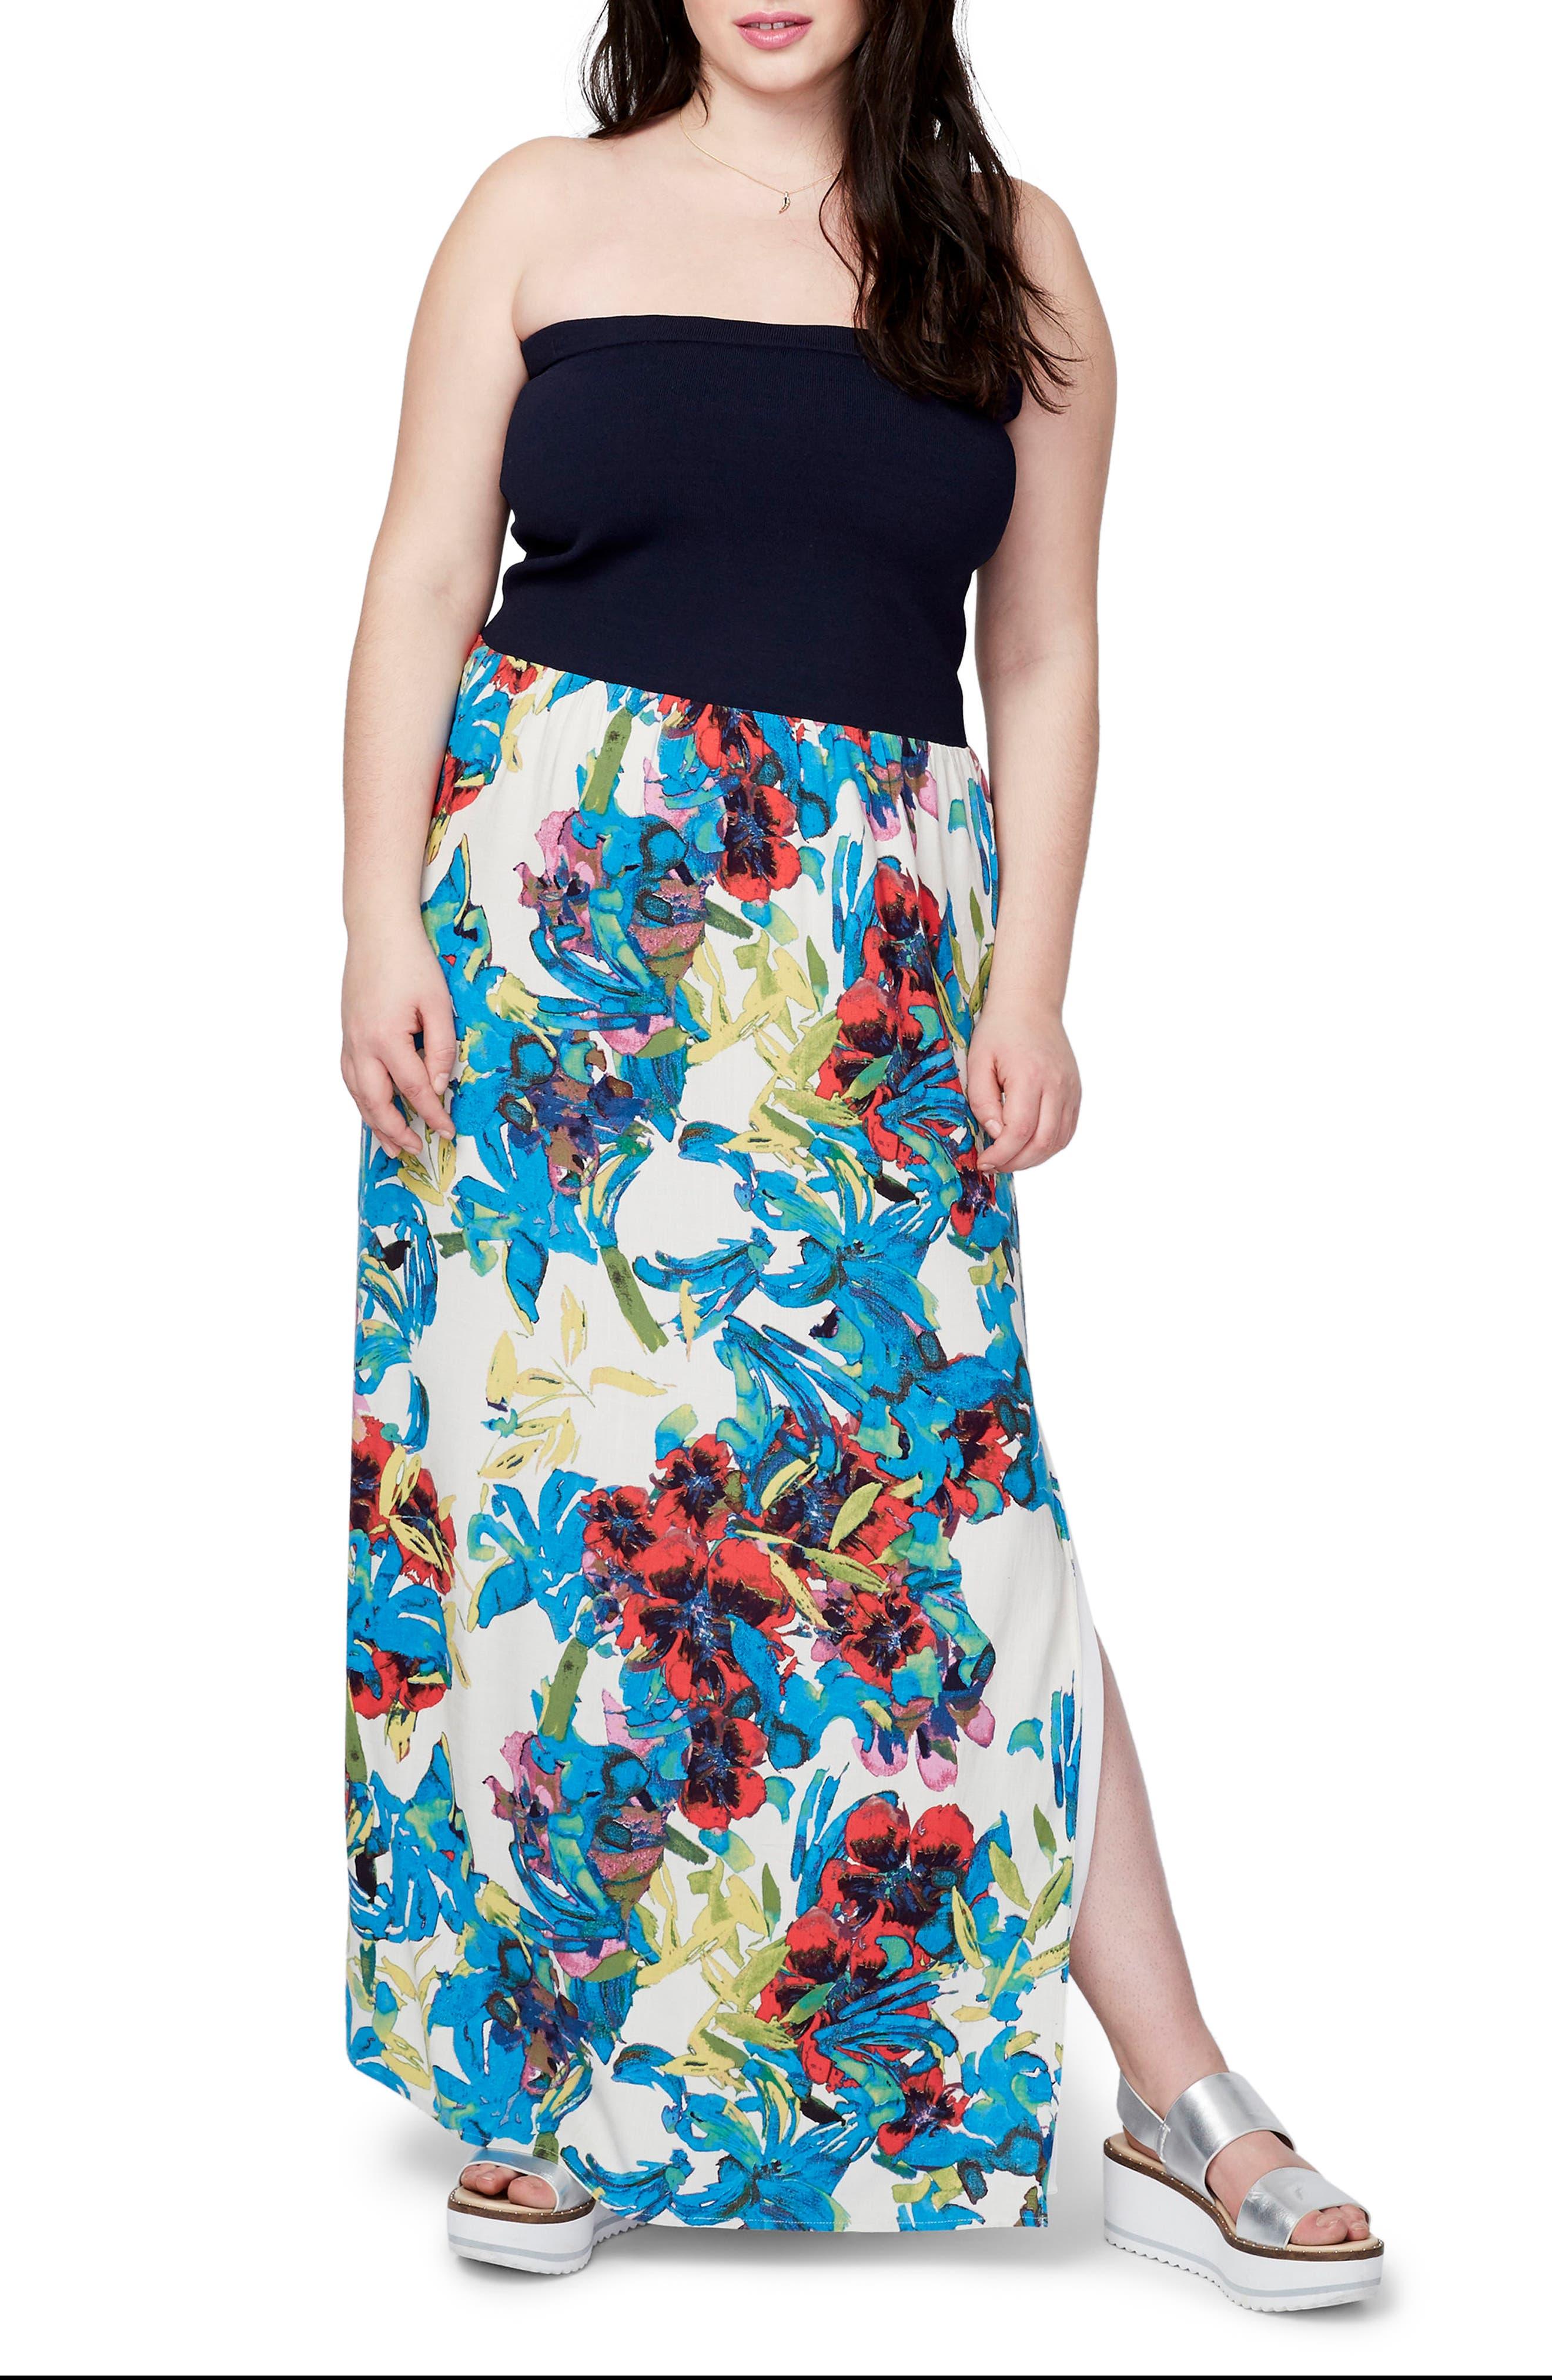 Alternate Image 1 Selected - RACHEL Rachel Roy Strapless Mixed Media Maxi Dress (Plus Size)